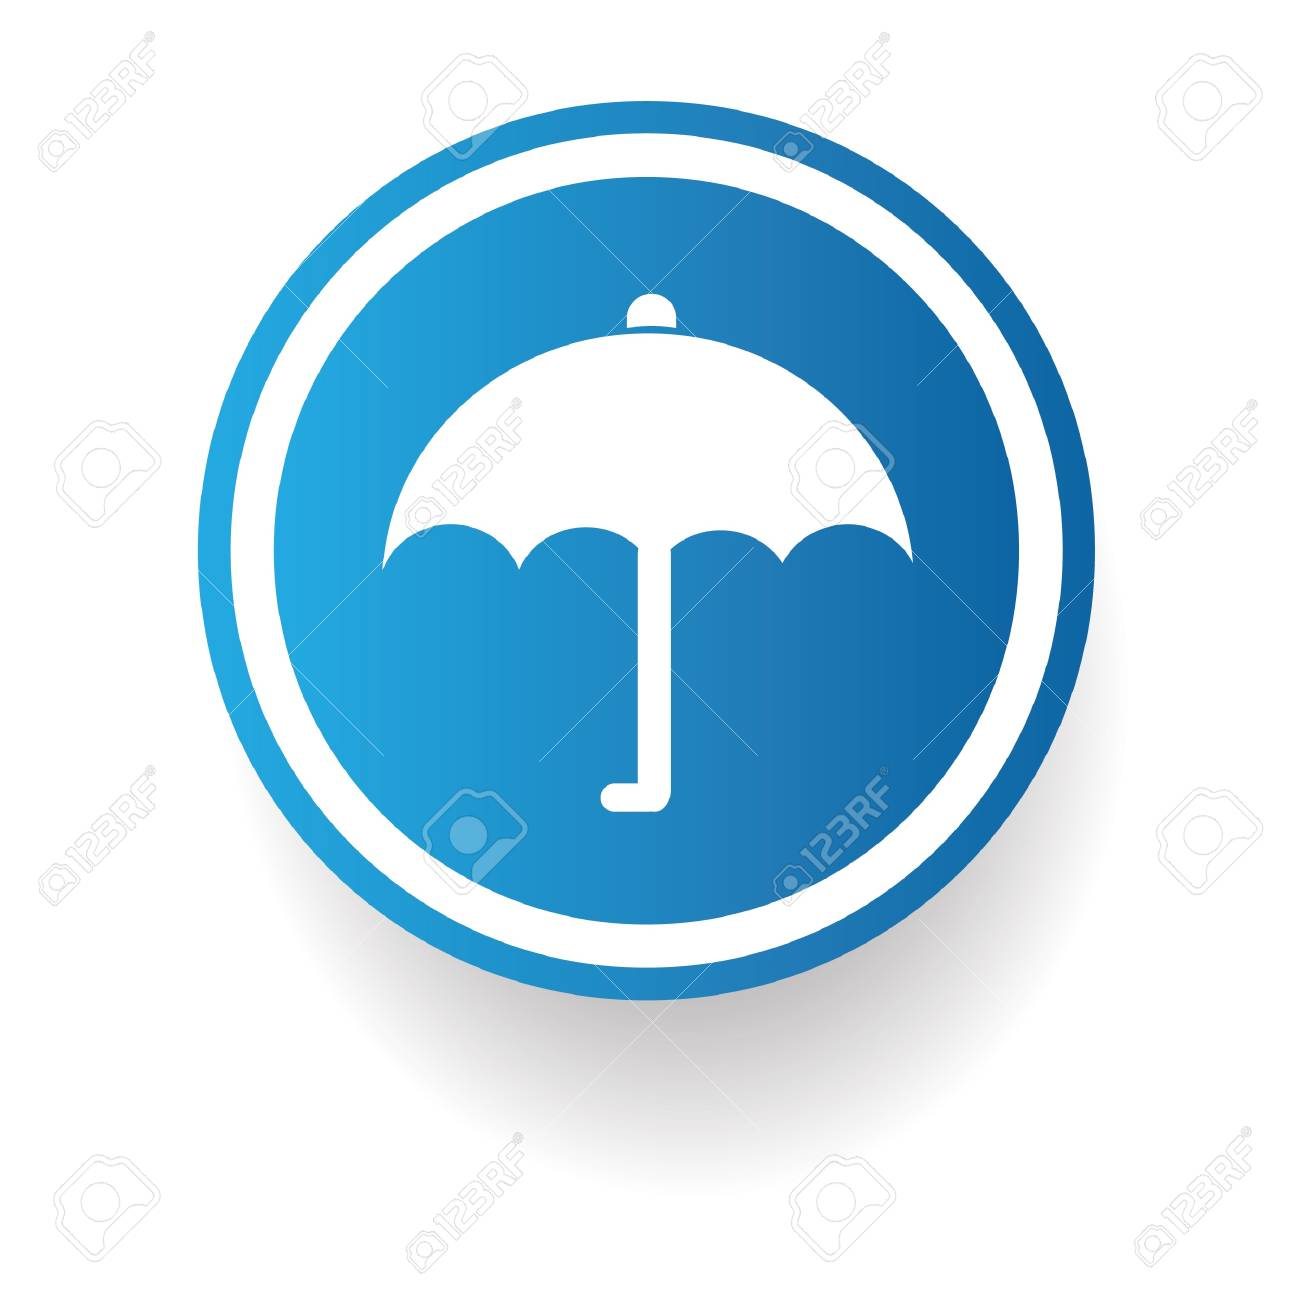 Umbrella sign Stock Vector - 20168070